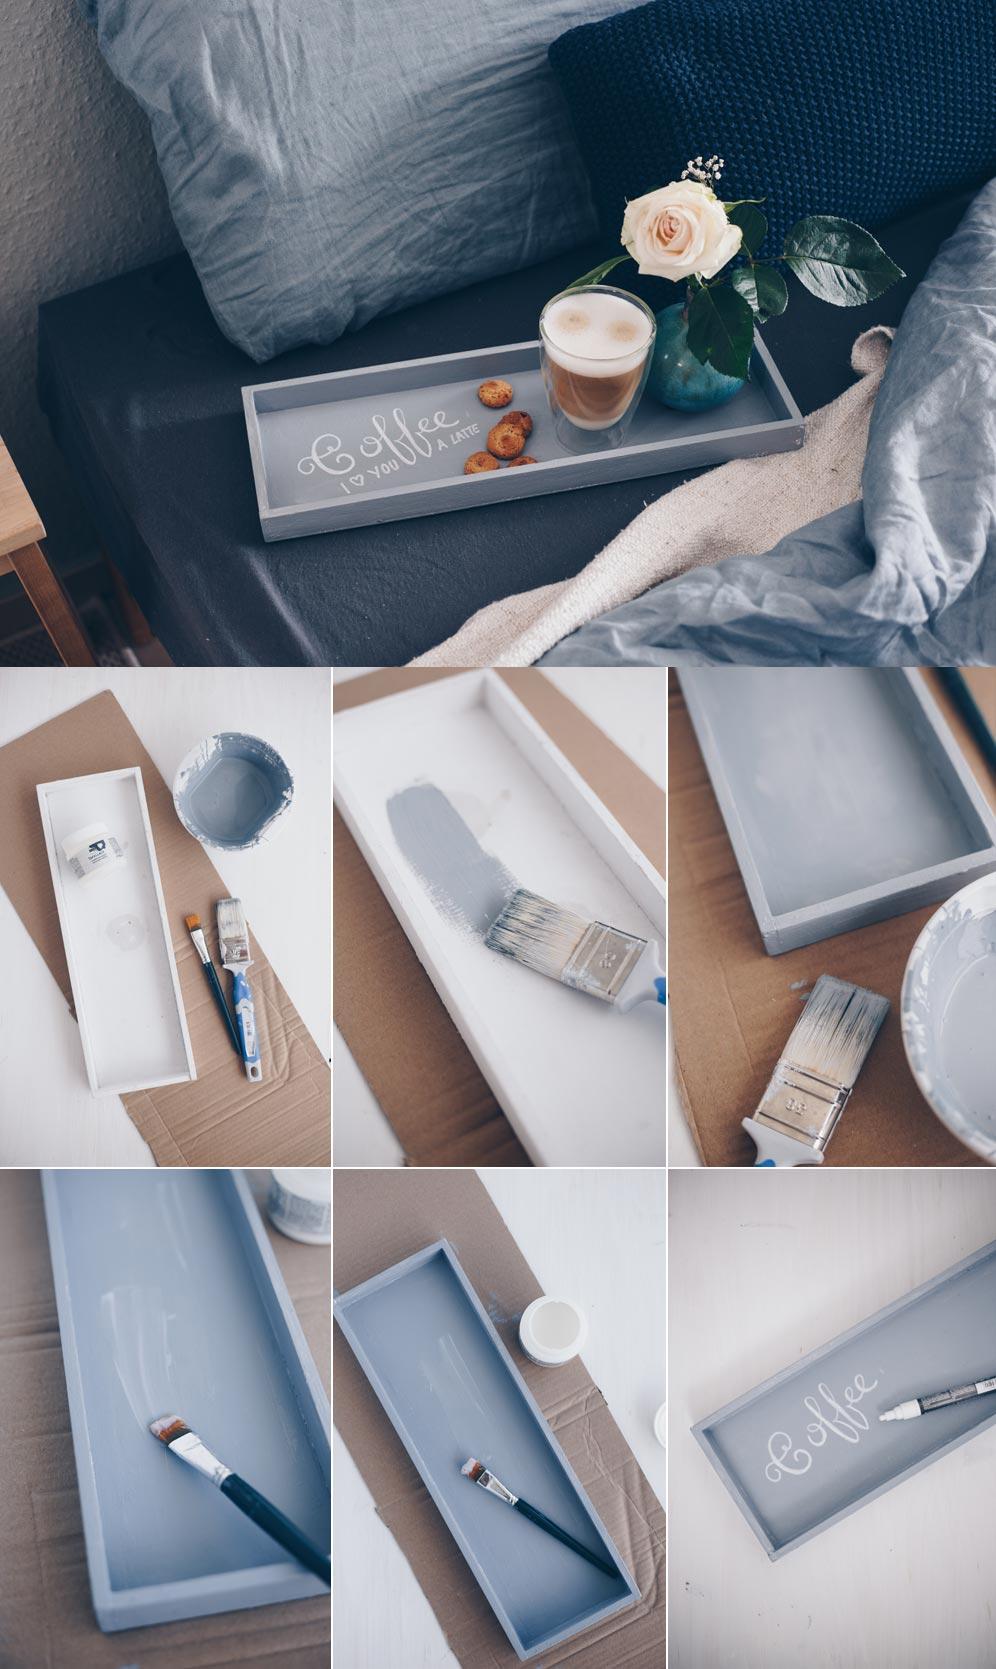 DIY beschreibbares Tablett selbermachen - Deko DIY - Wiederbeschriftbares Tablett mit Tafellack - Handletting DIY Schritt-für-Schritt